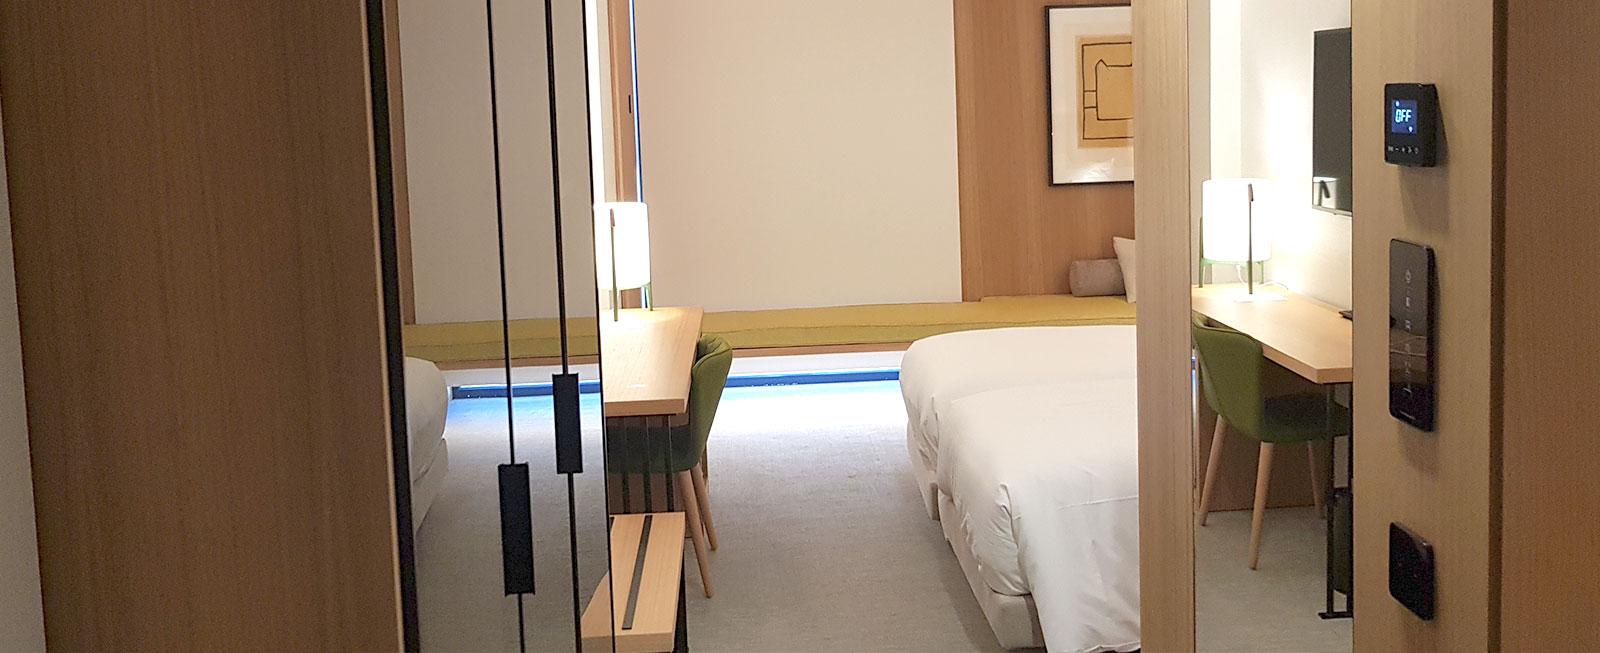 Doppelzimmer Executive Protur Naisa Urbanhotel Palma